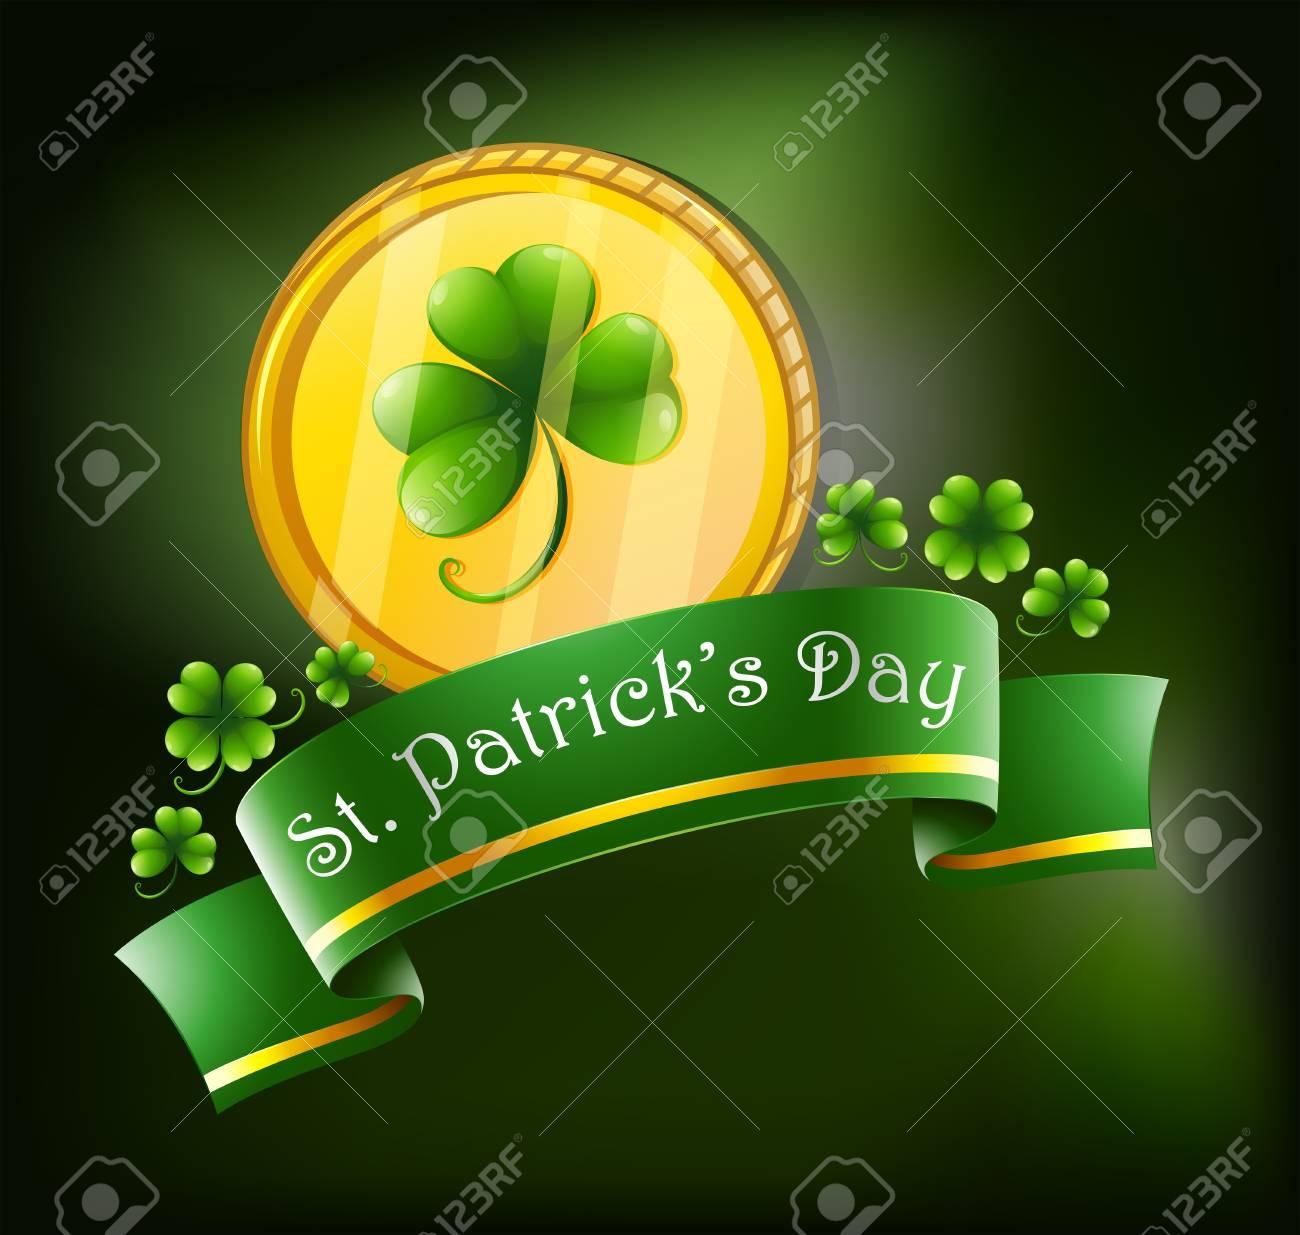 Illustration of the symbols for St. Patrick's celebration Stock Vector - 18390348